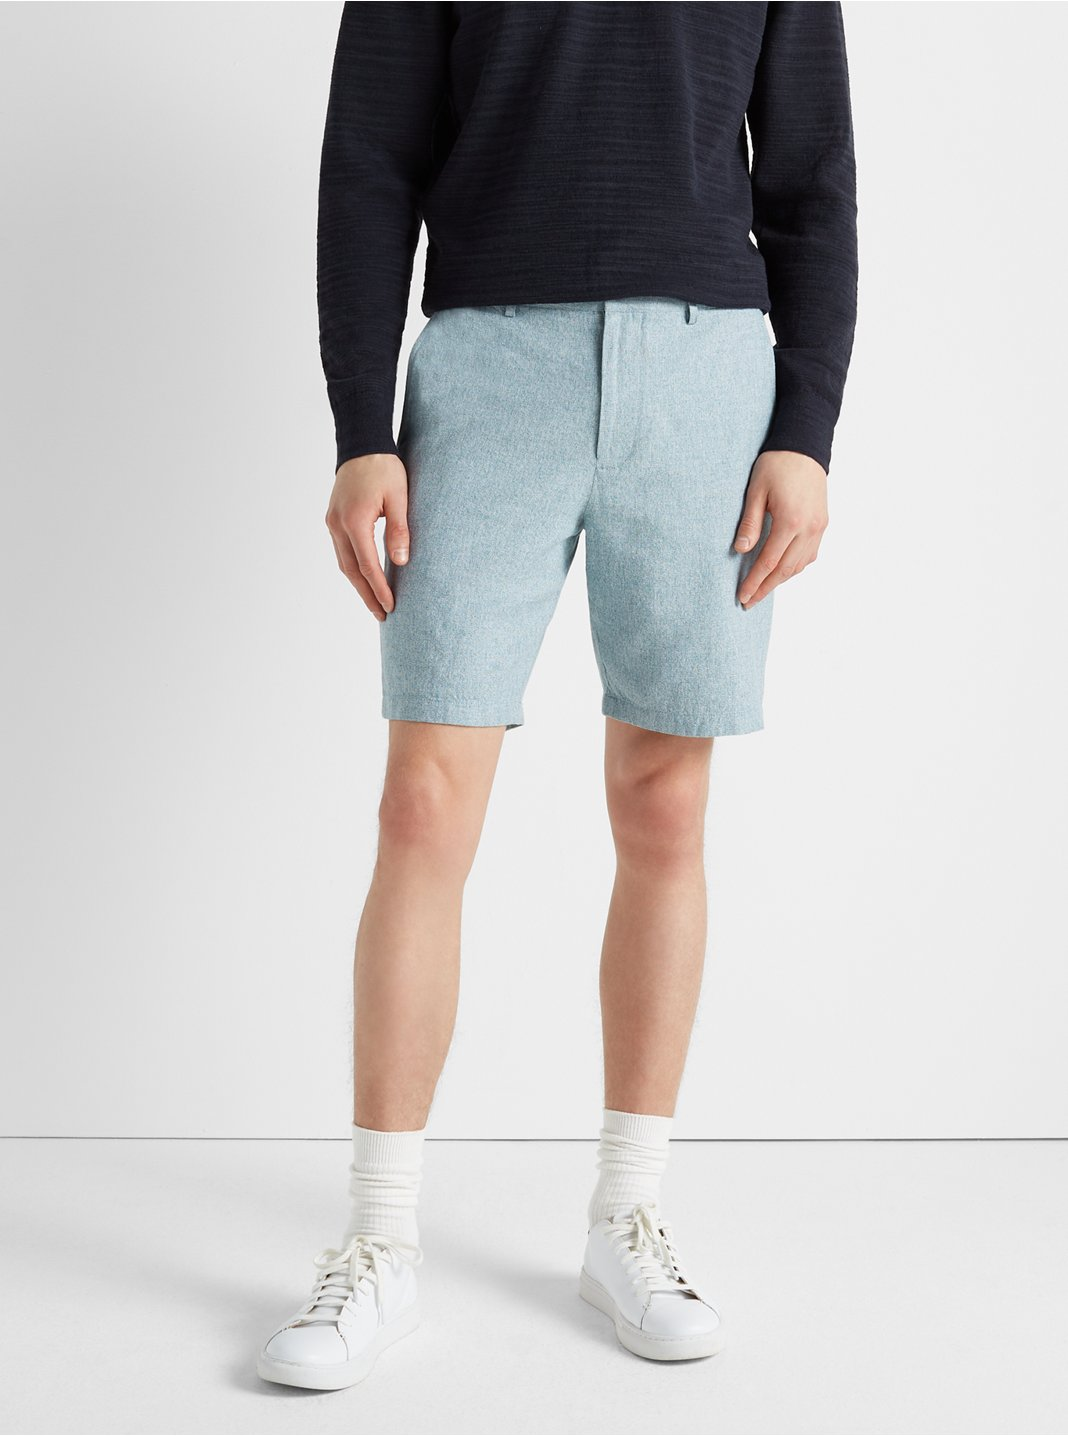 "Maddox Jaspe 9"" Shorts"